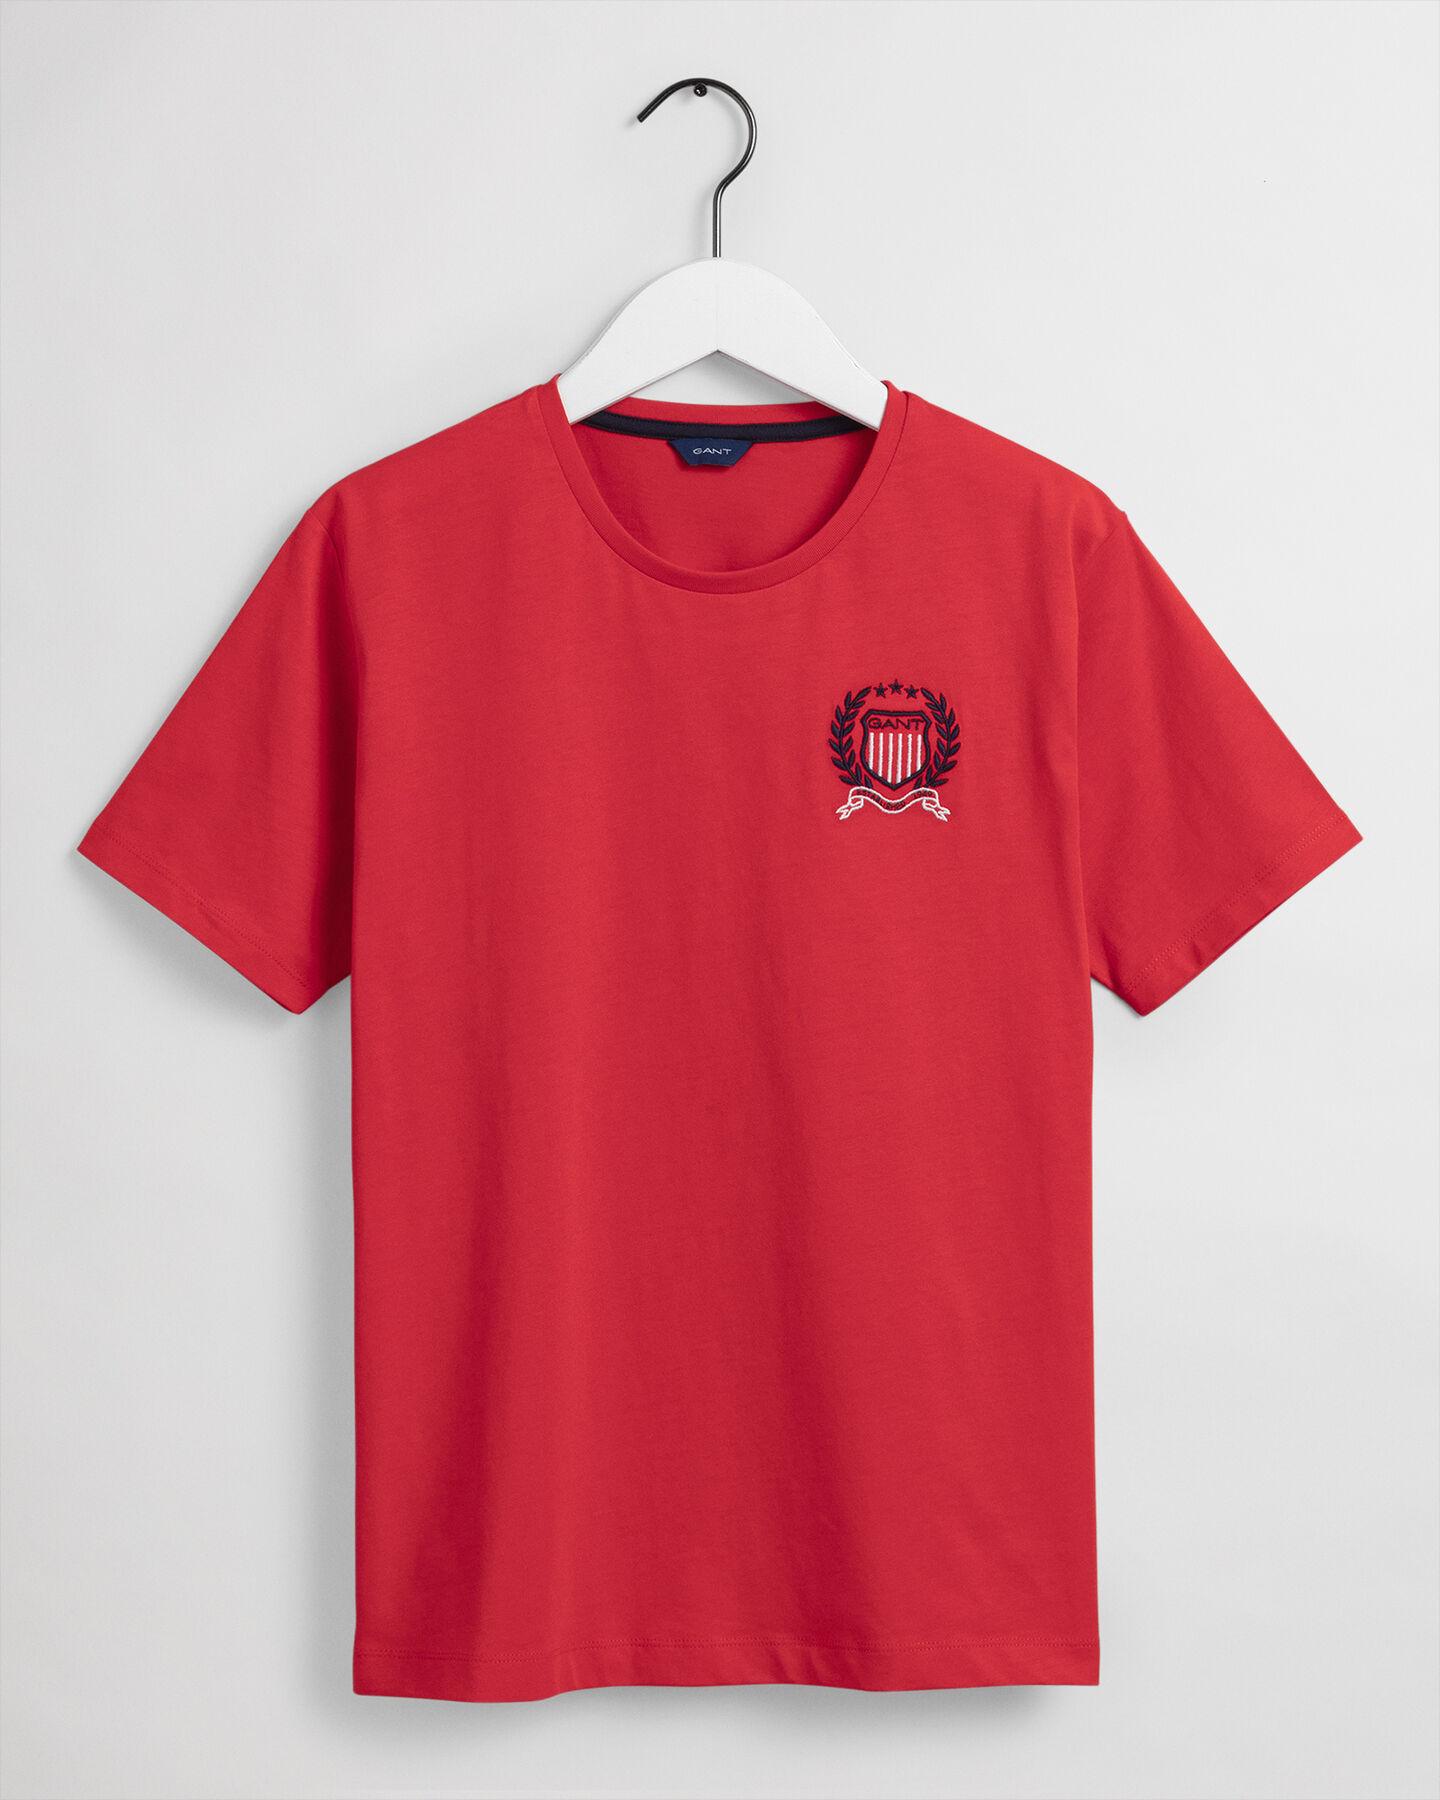 Teen Boys Medium Crest T-shirt